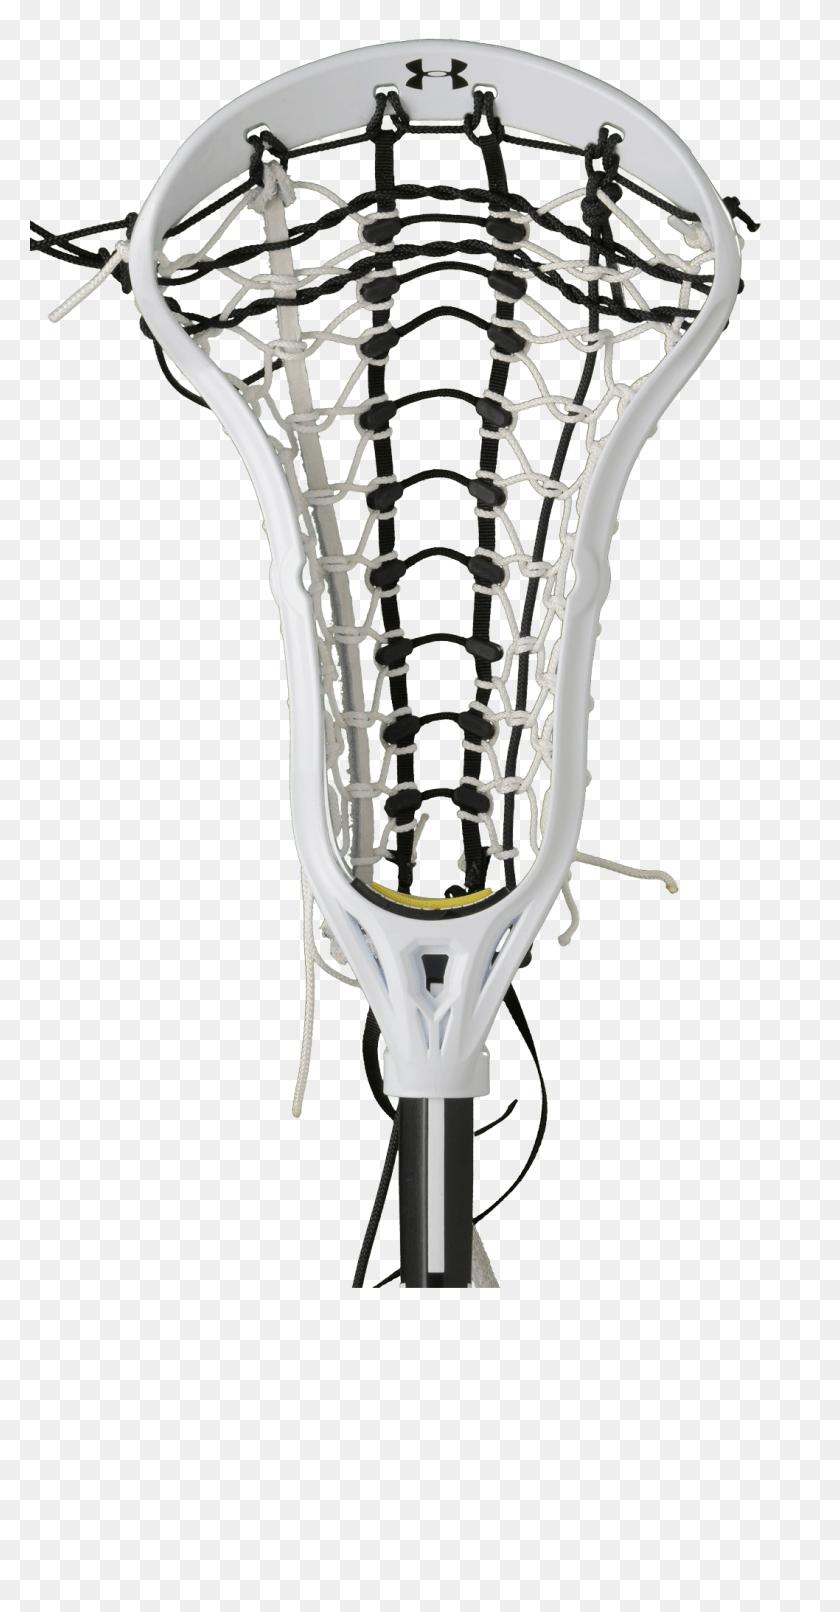 medium resolution of lax pocket customizable rail pocket lacrosse stick png